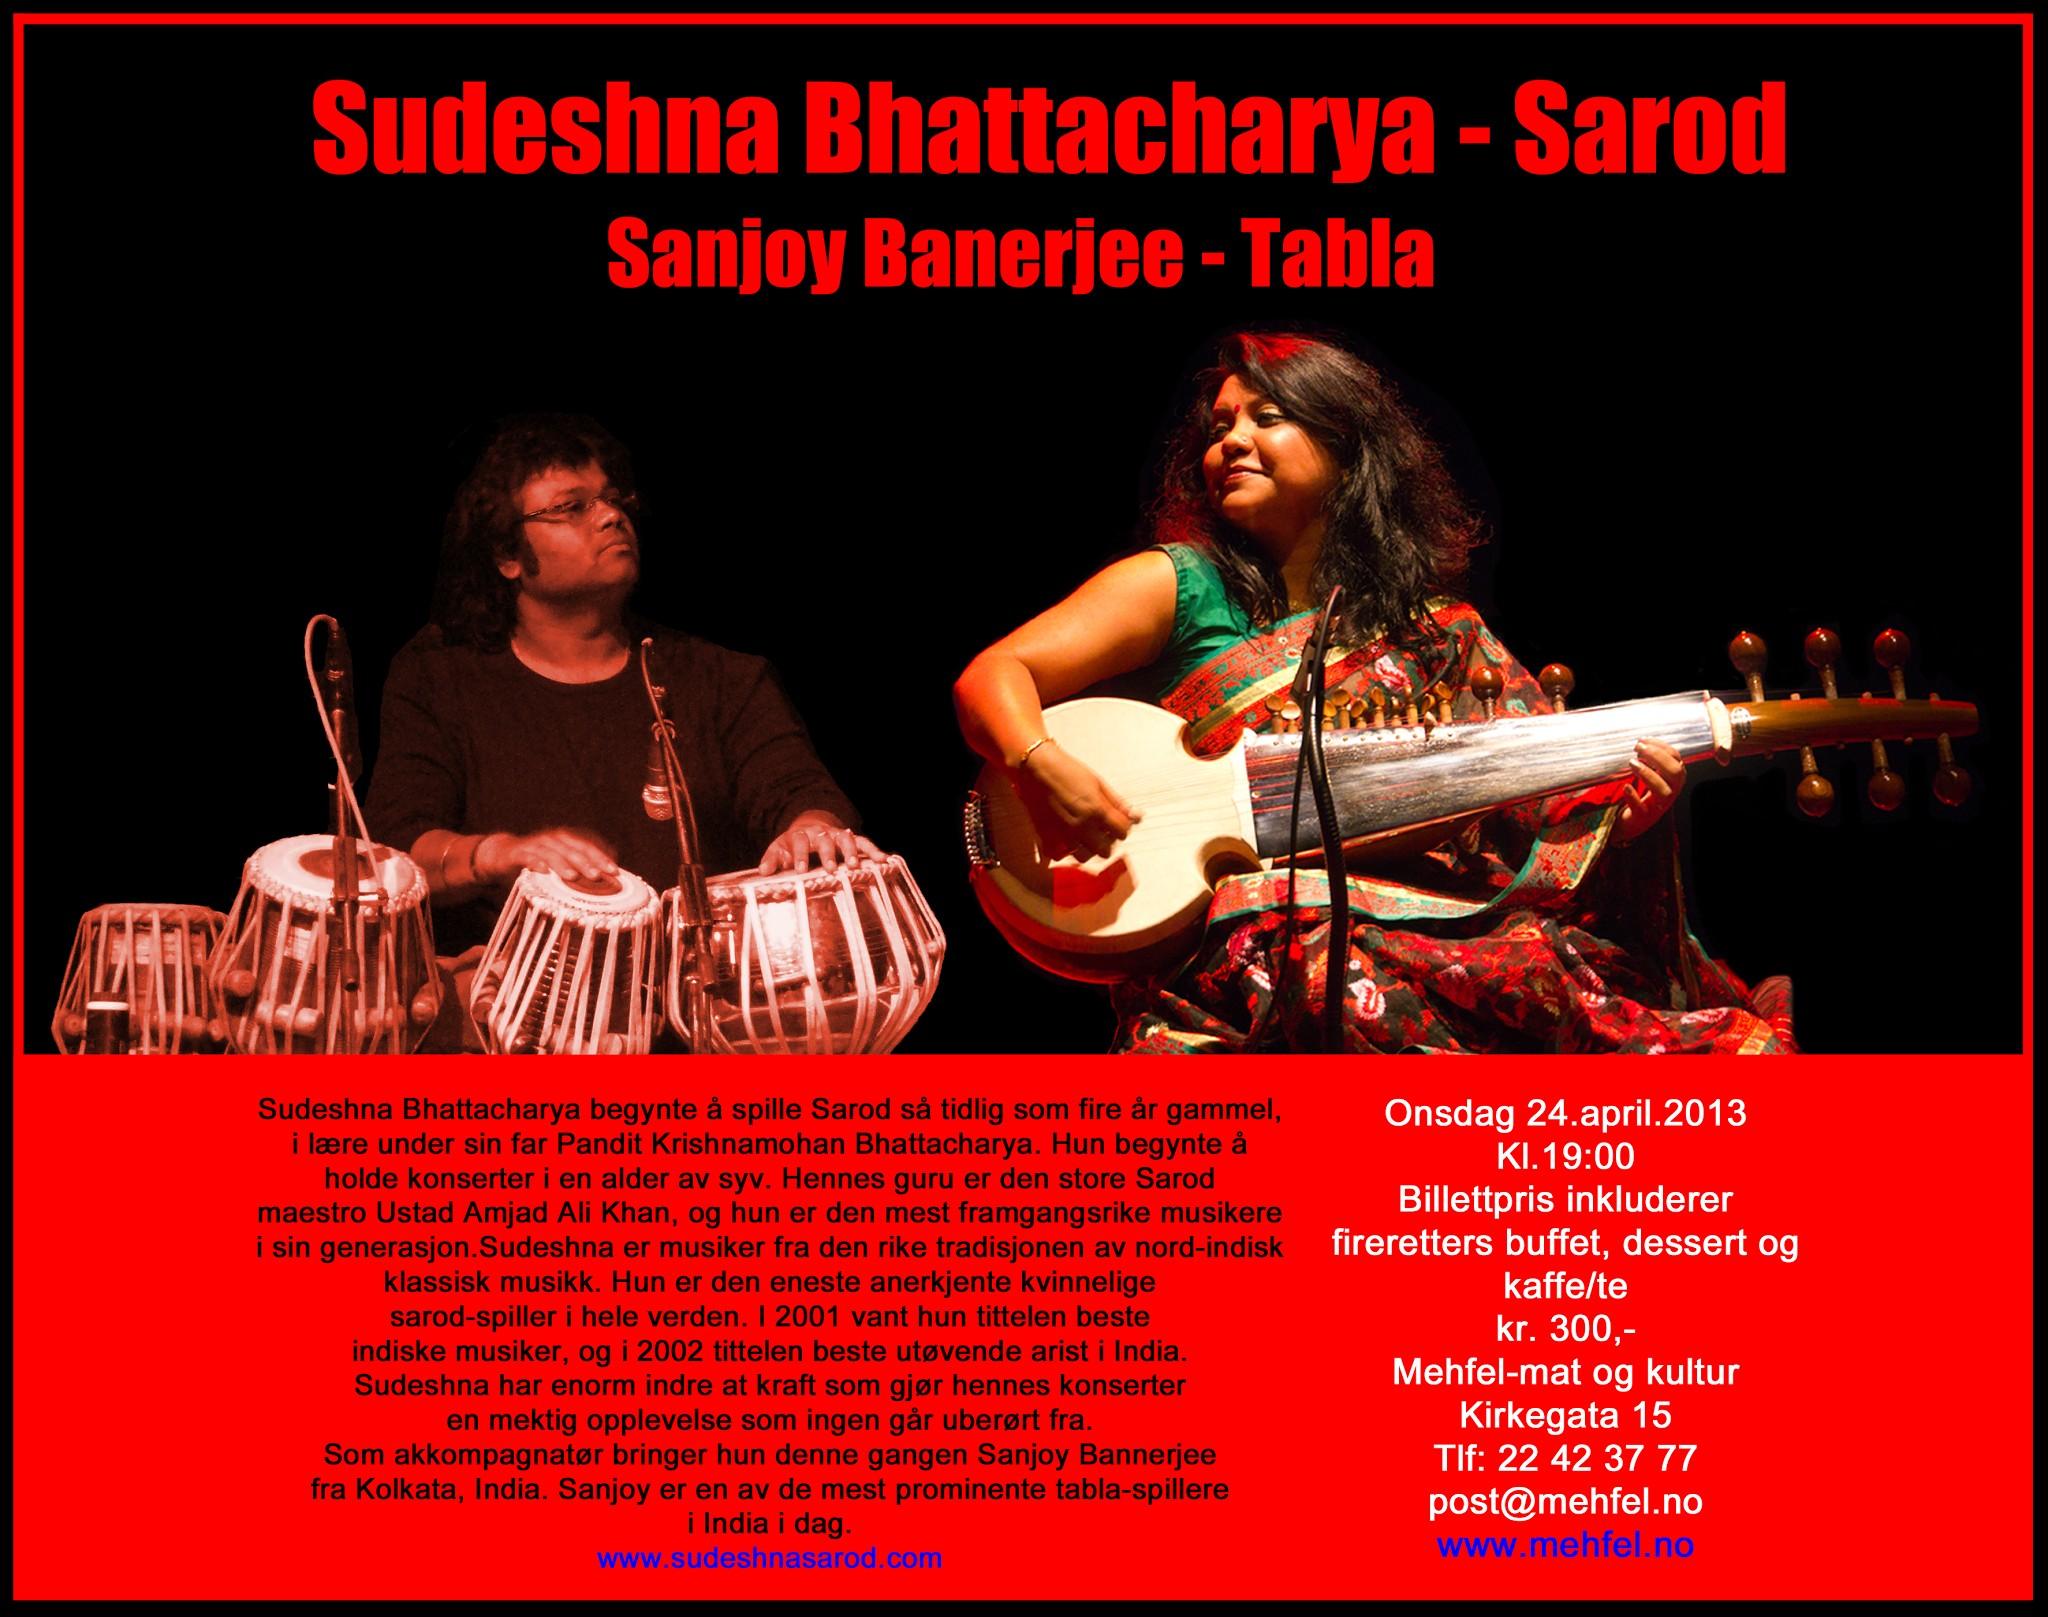 Photo: Sudeshna Bhattacharya - Concert Mehfel, Oslo Norway, 24 April 2013 - sabART